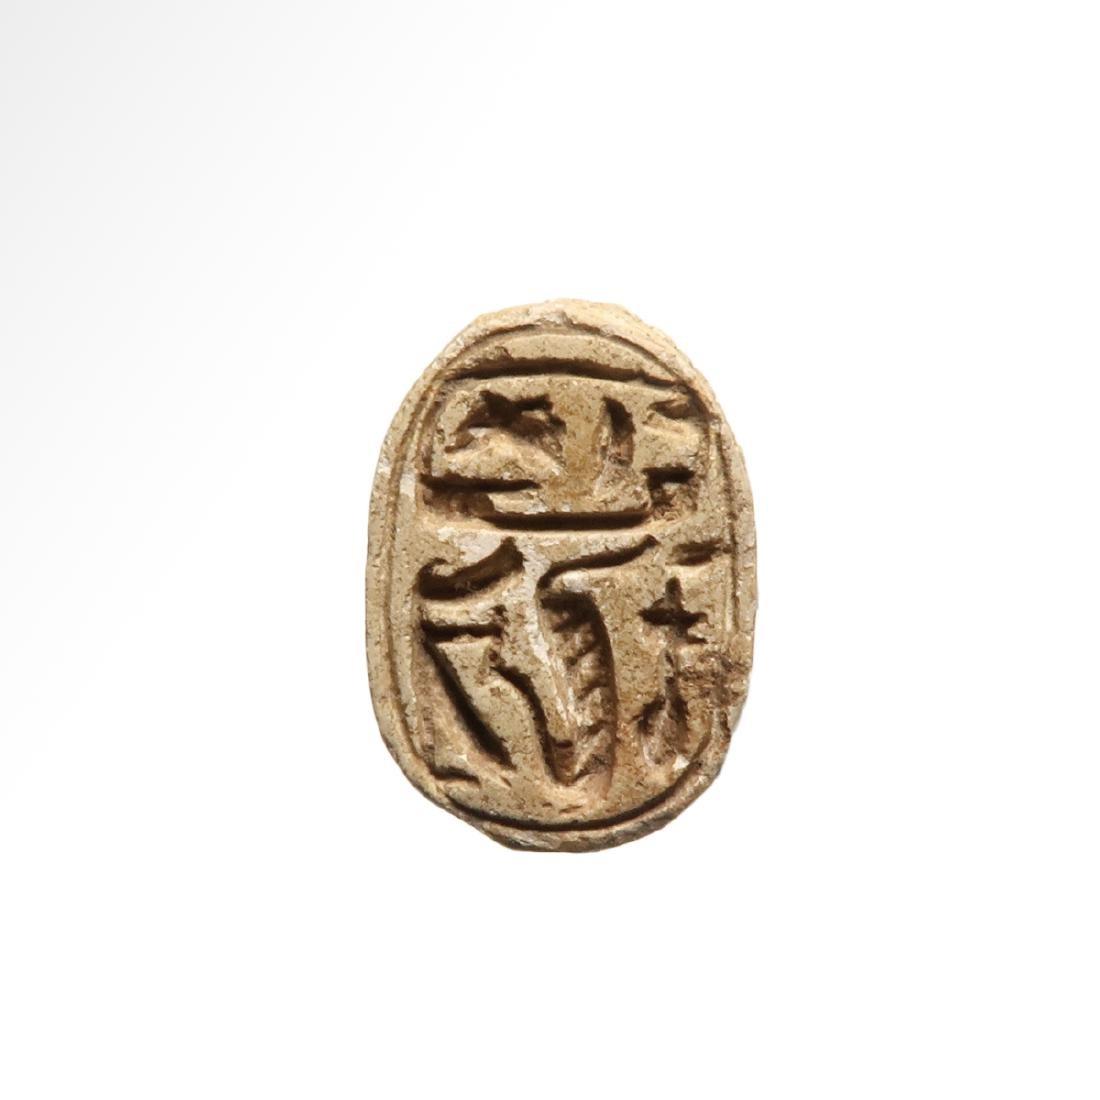 Egyptian Steatite Scarab, Hieroglyphs and Cartouche